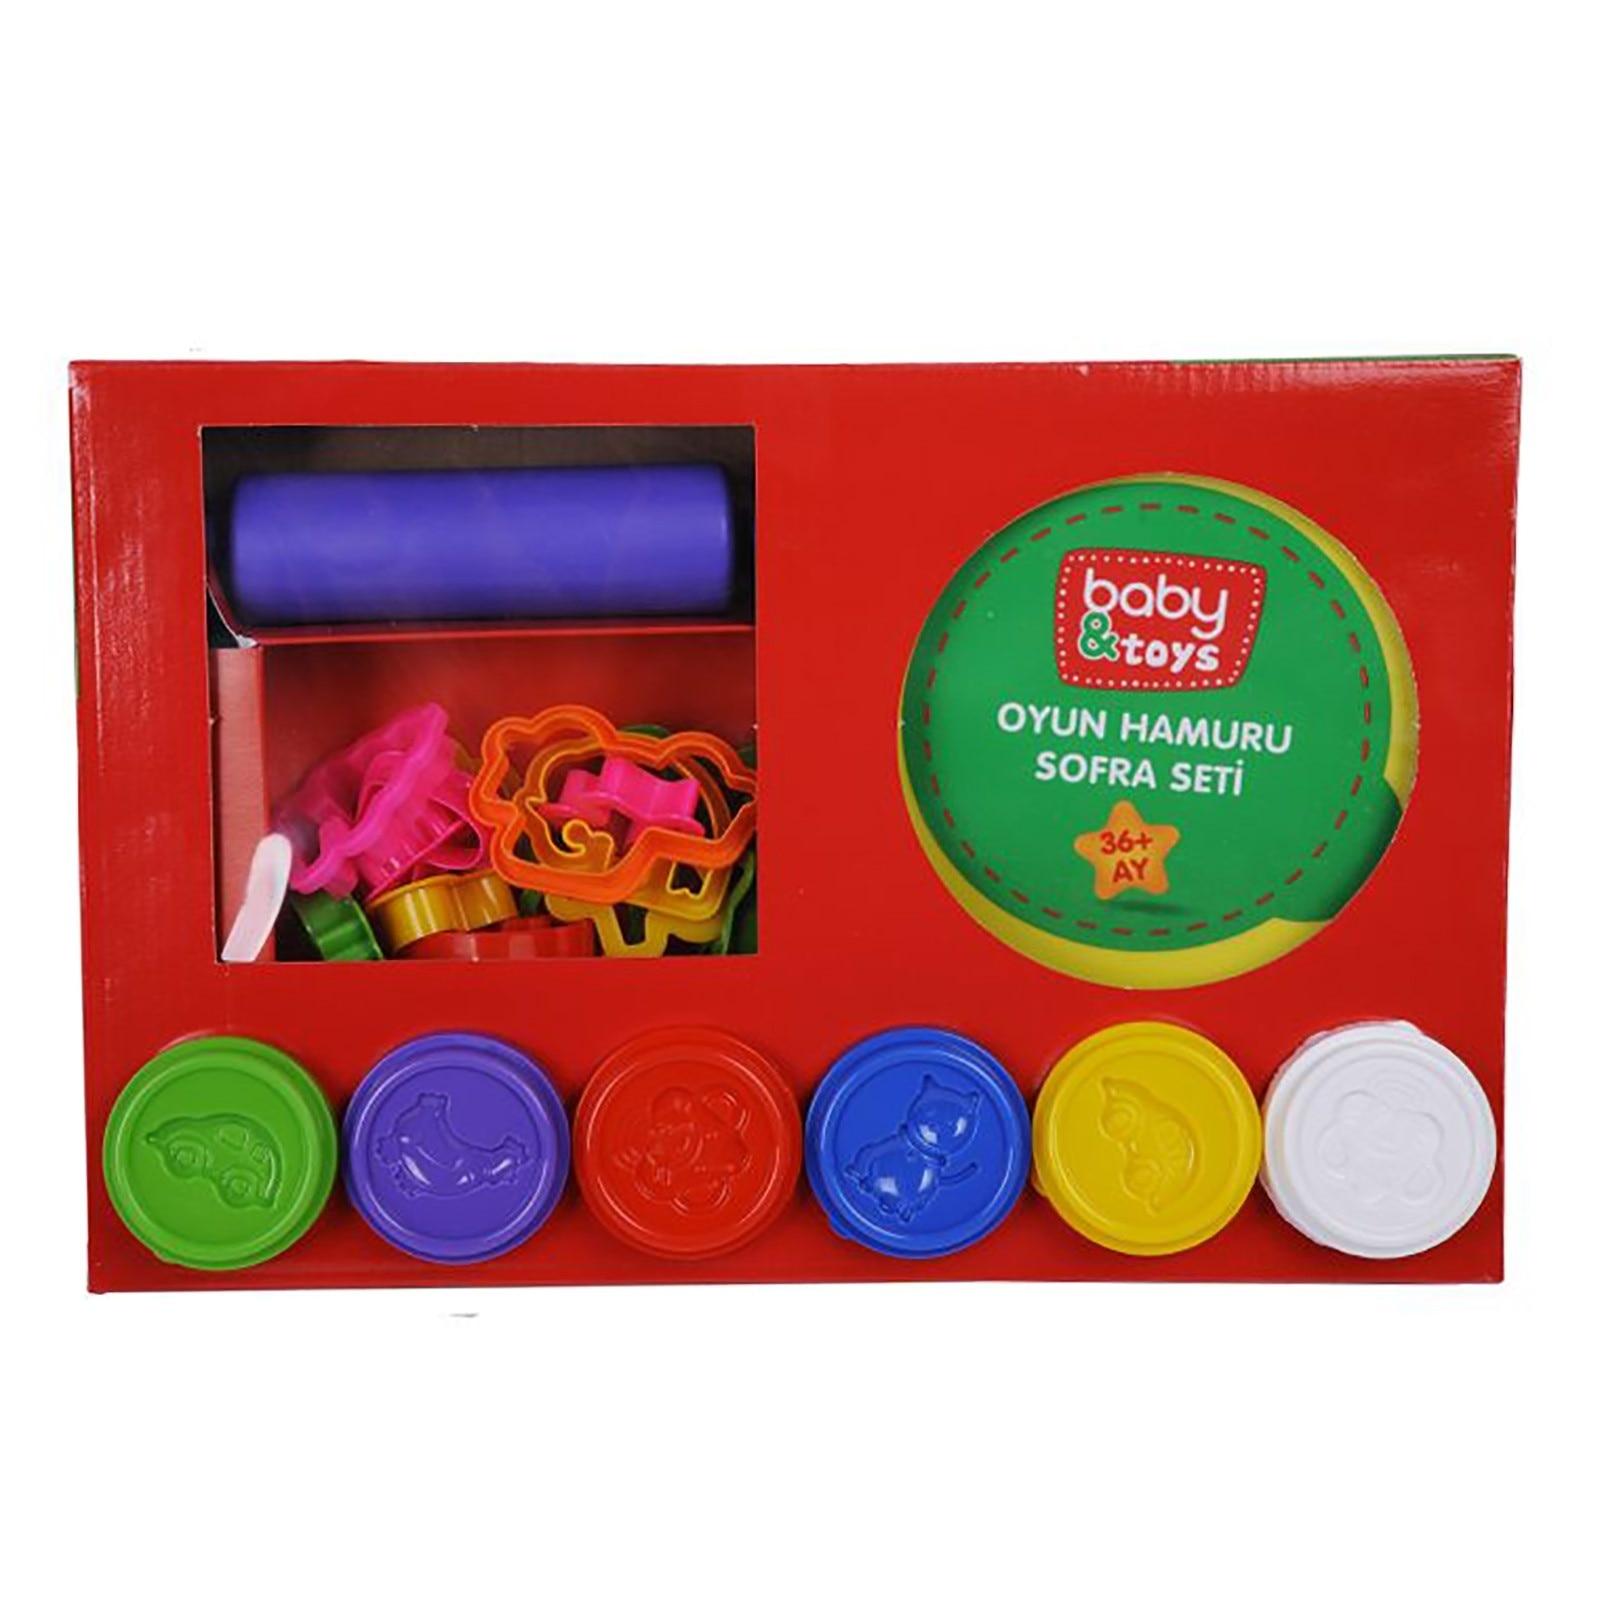 Ebebek Baby&toys Baby Playing Dough Toy Set